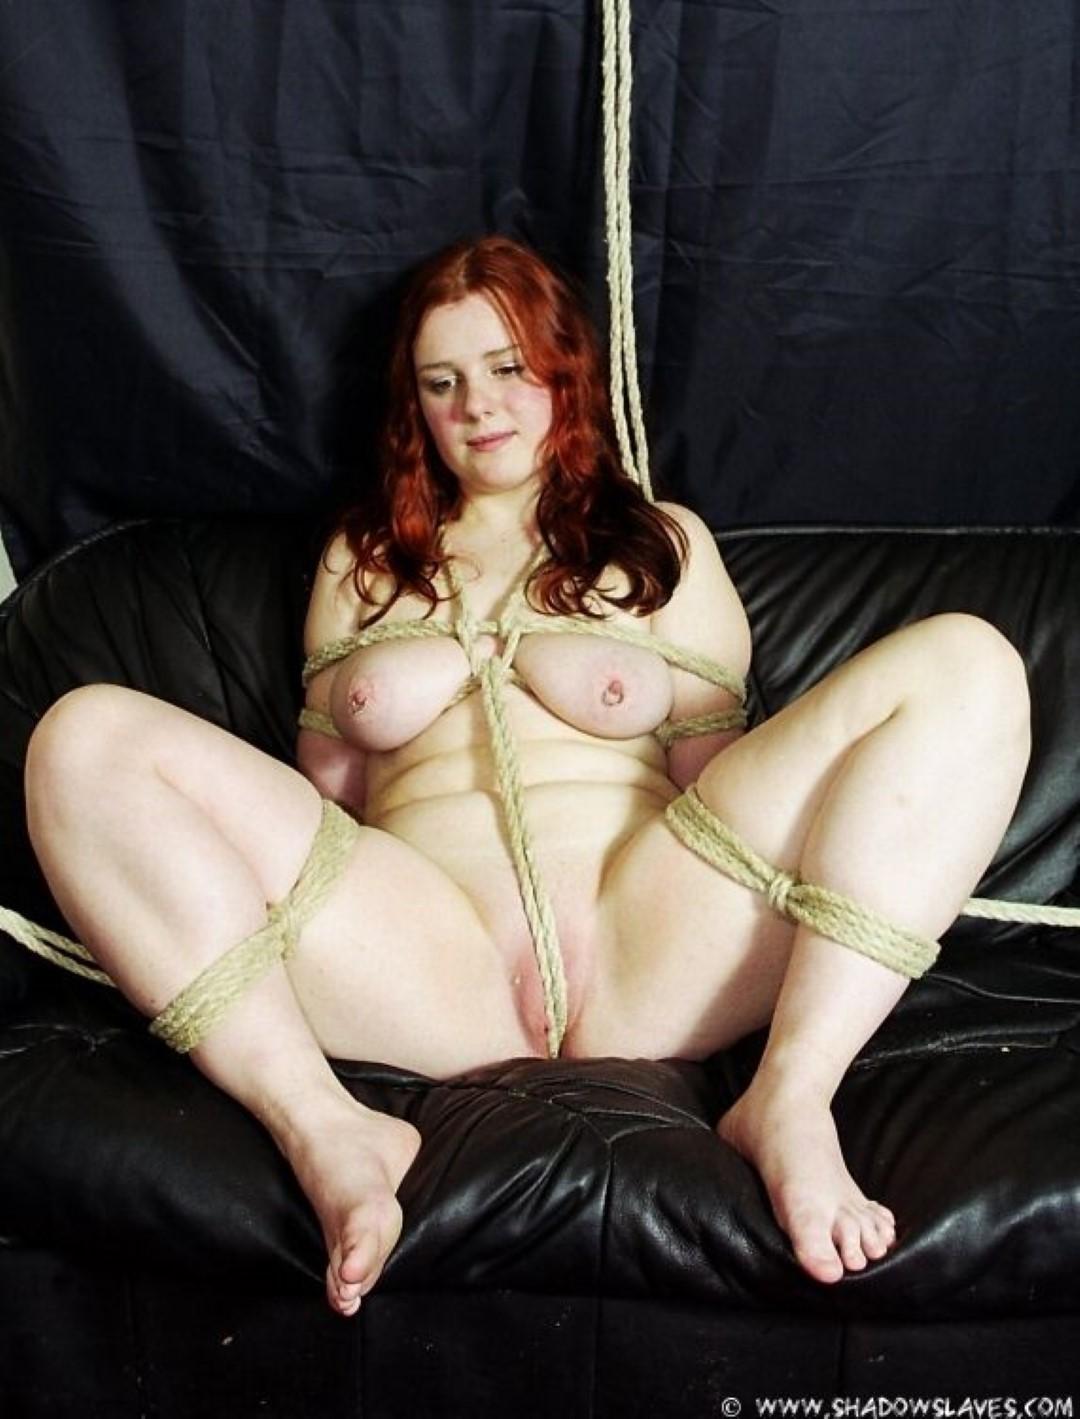 redhead chubby slut